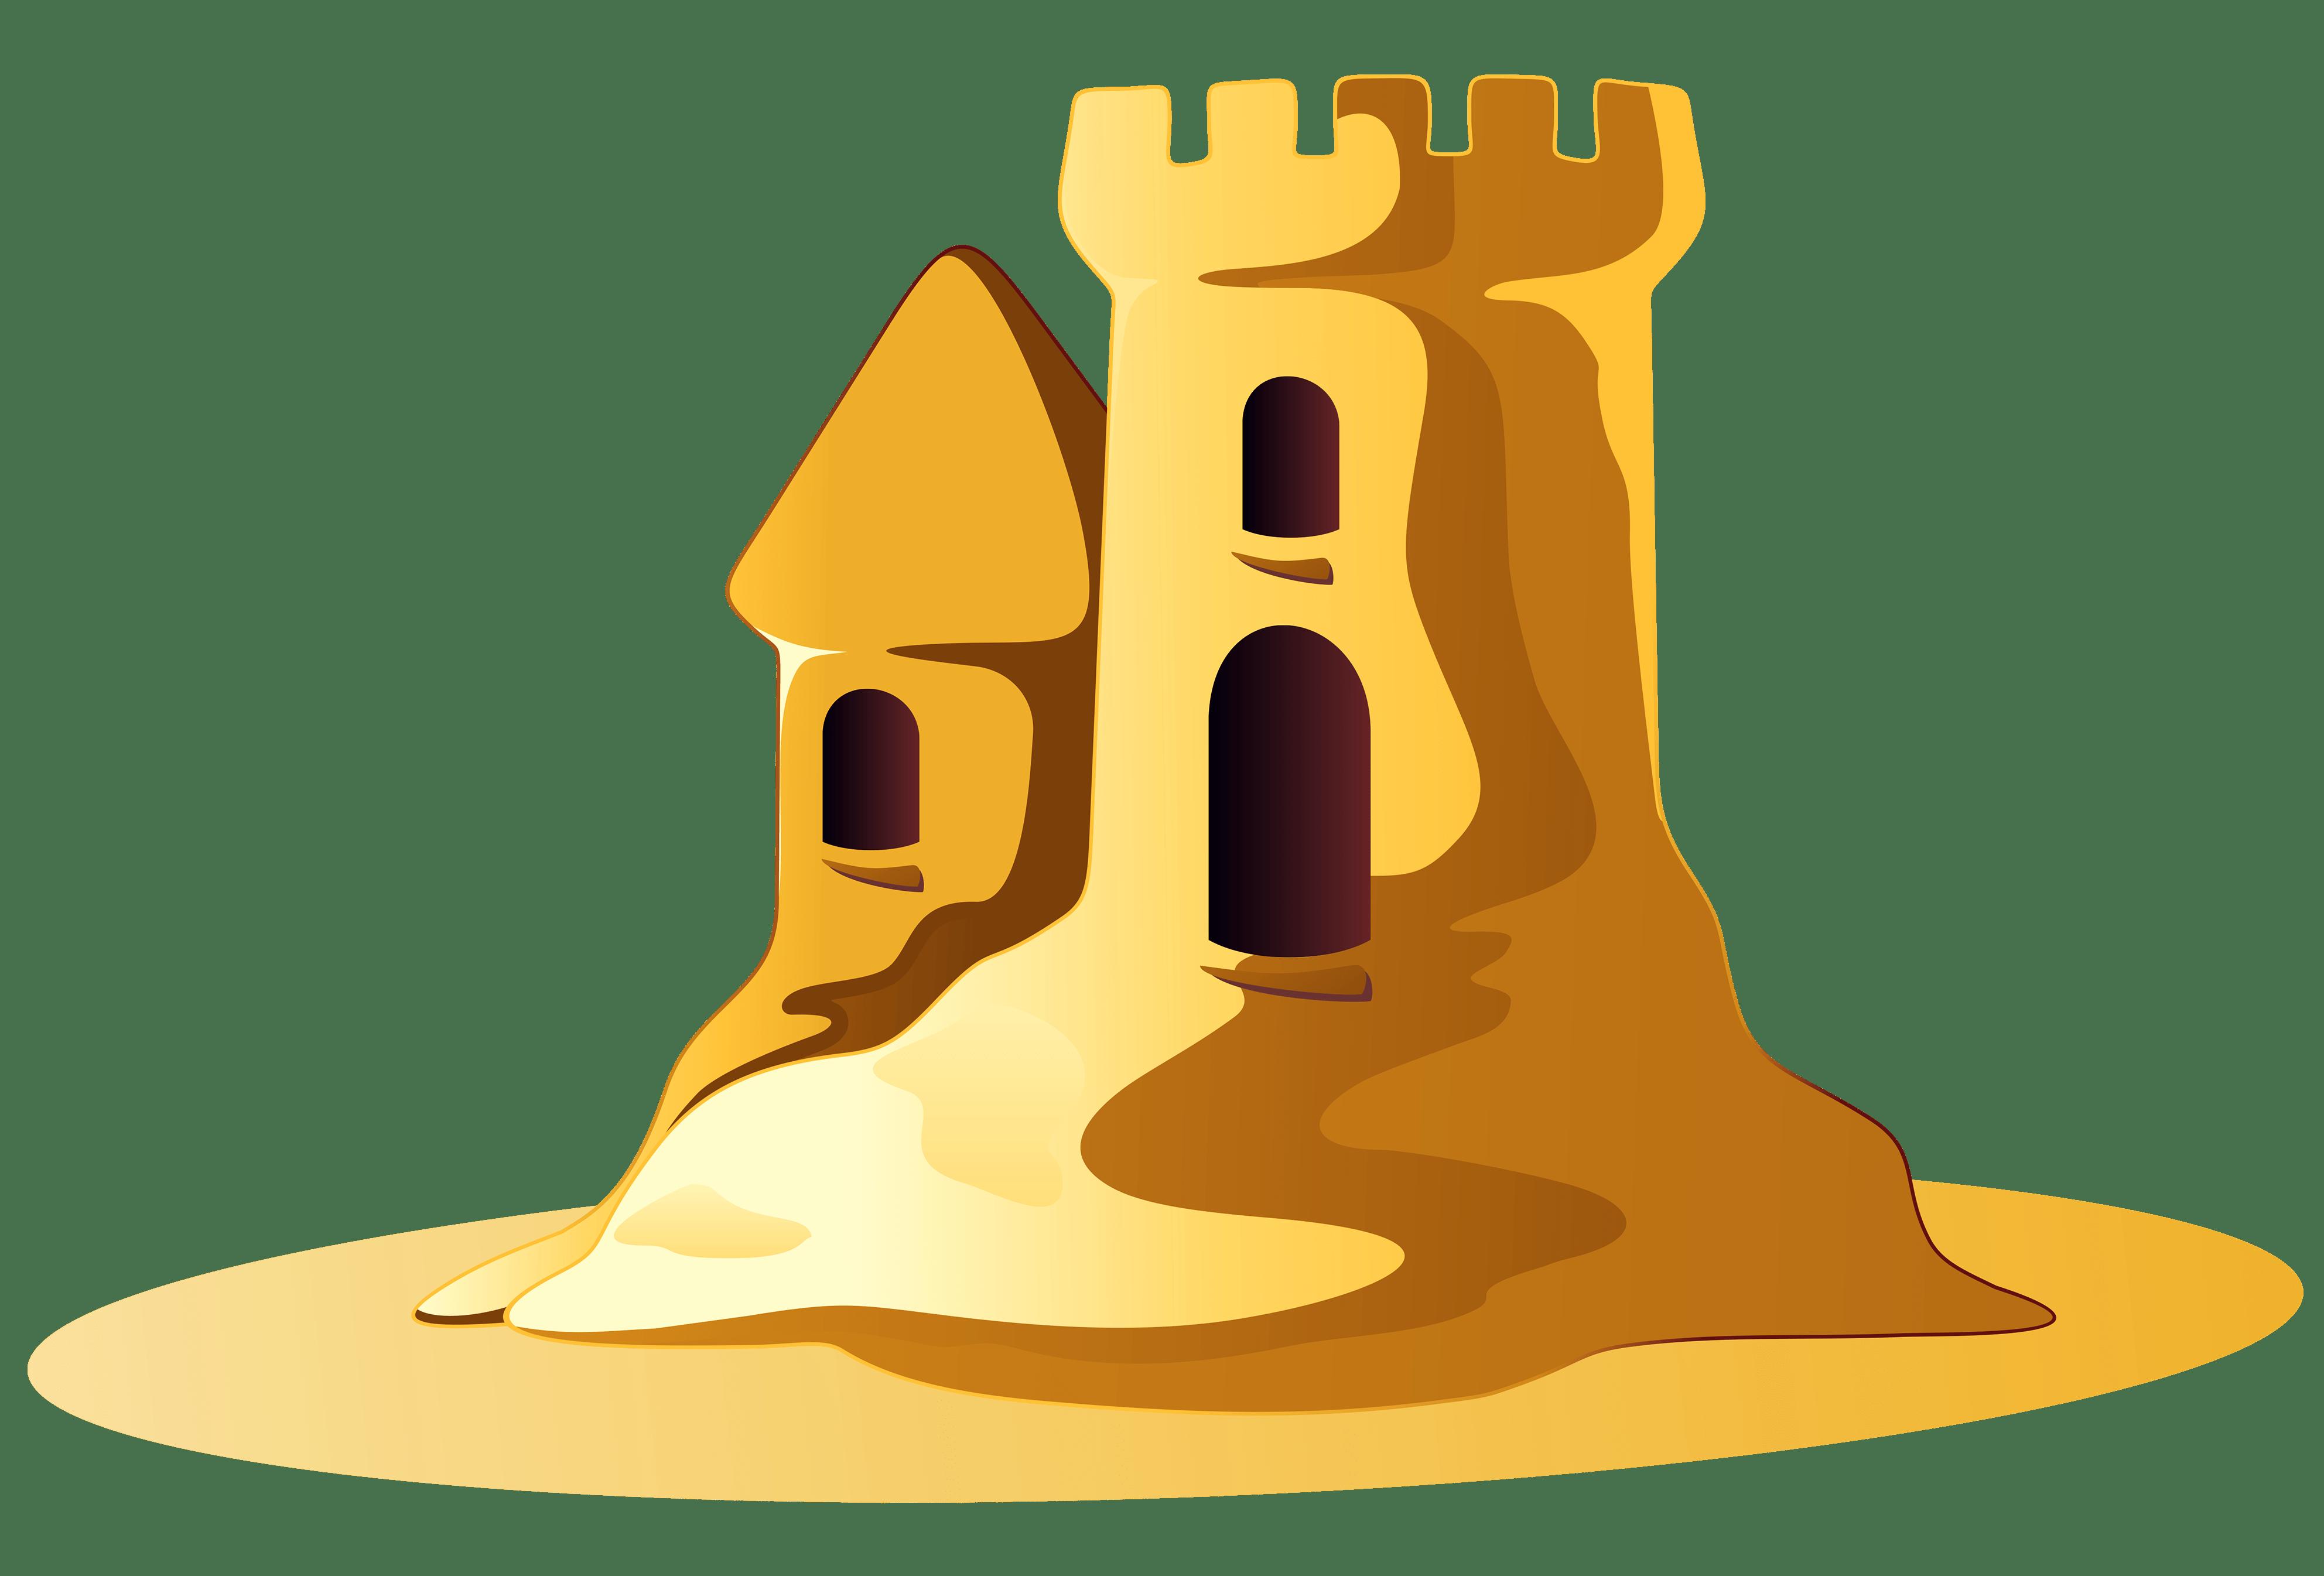 small sand castle clipart transparent png stickpng rh stickpng com Sand Clip Art Mexcan Sand